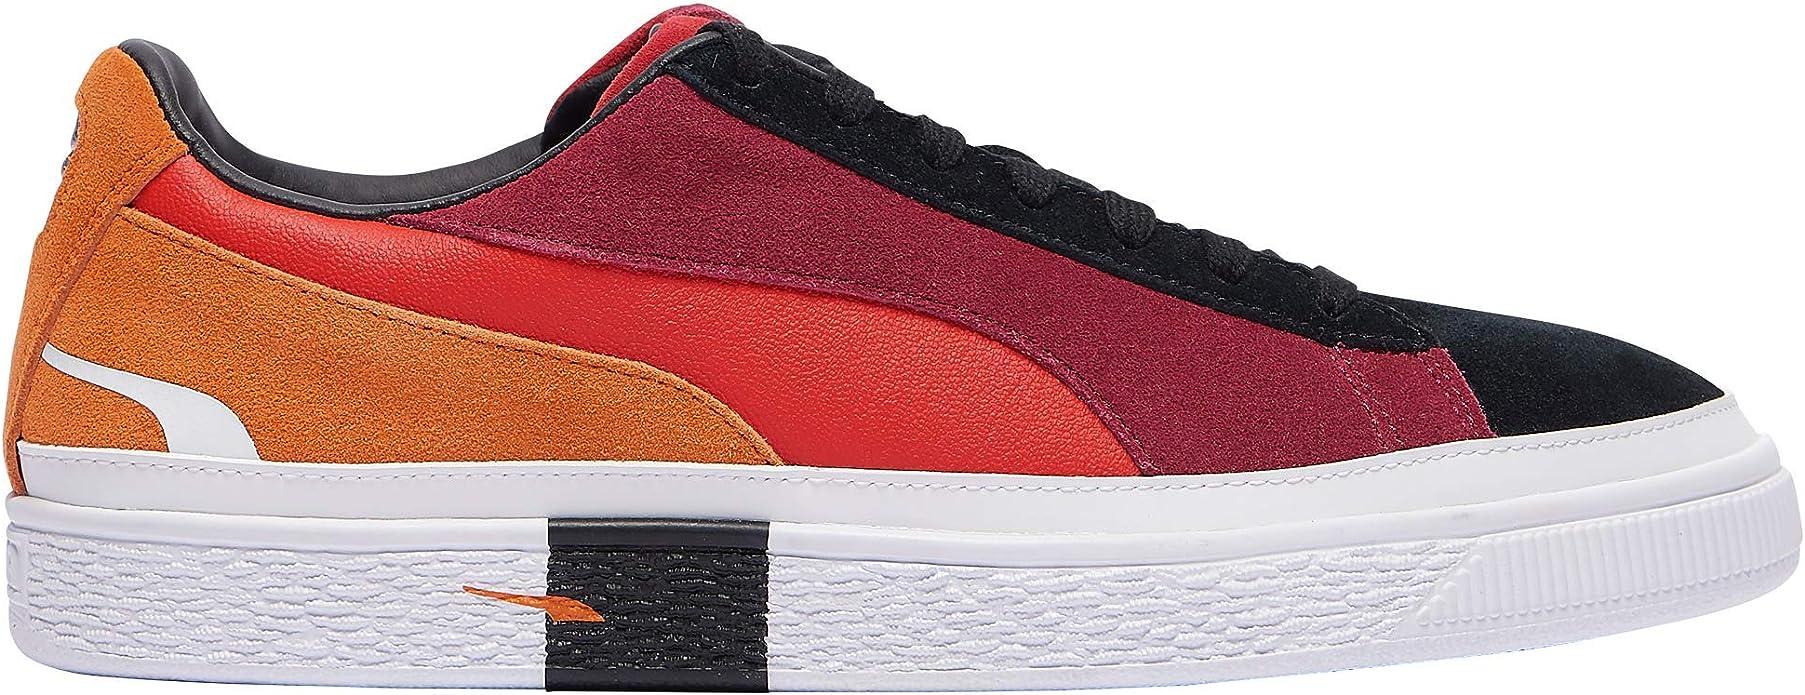 Amazon.com: PUMA Suede Hacked FS: Shoes